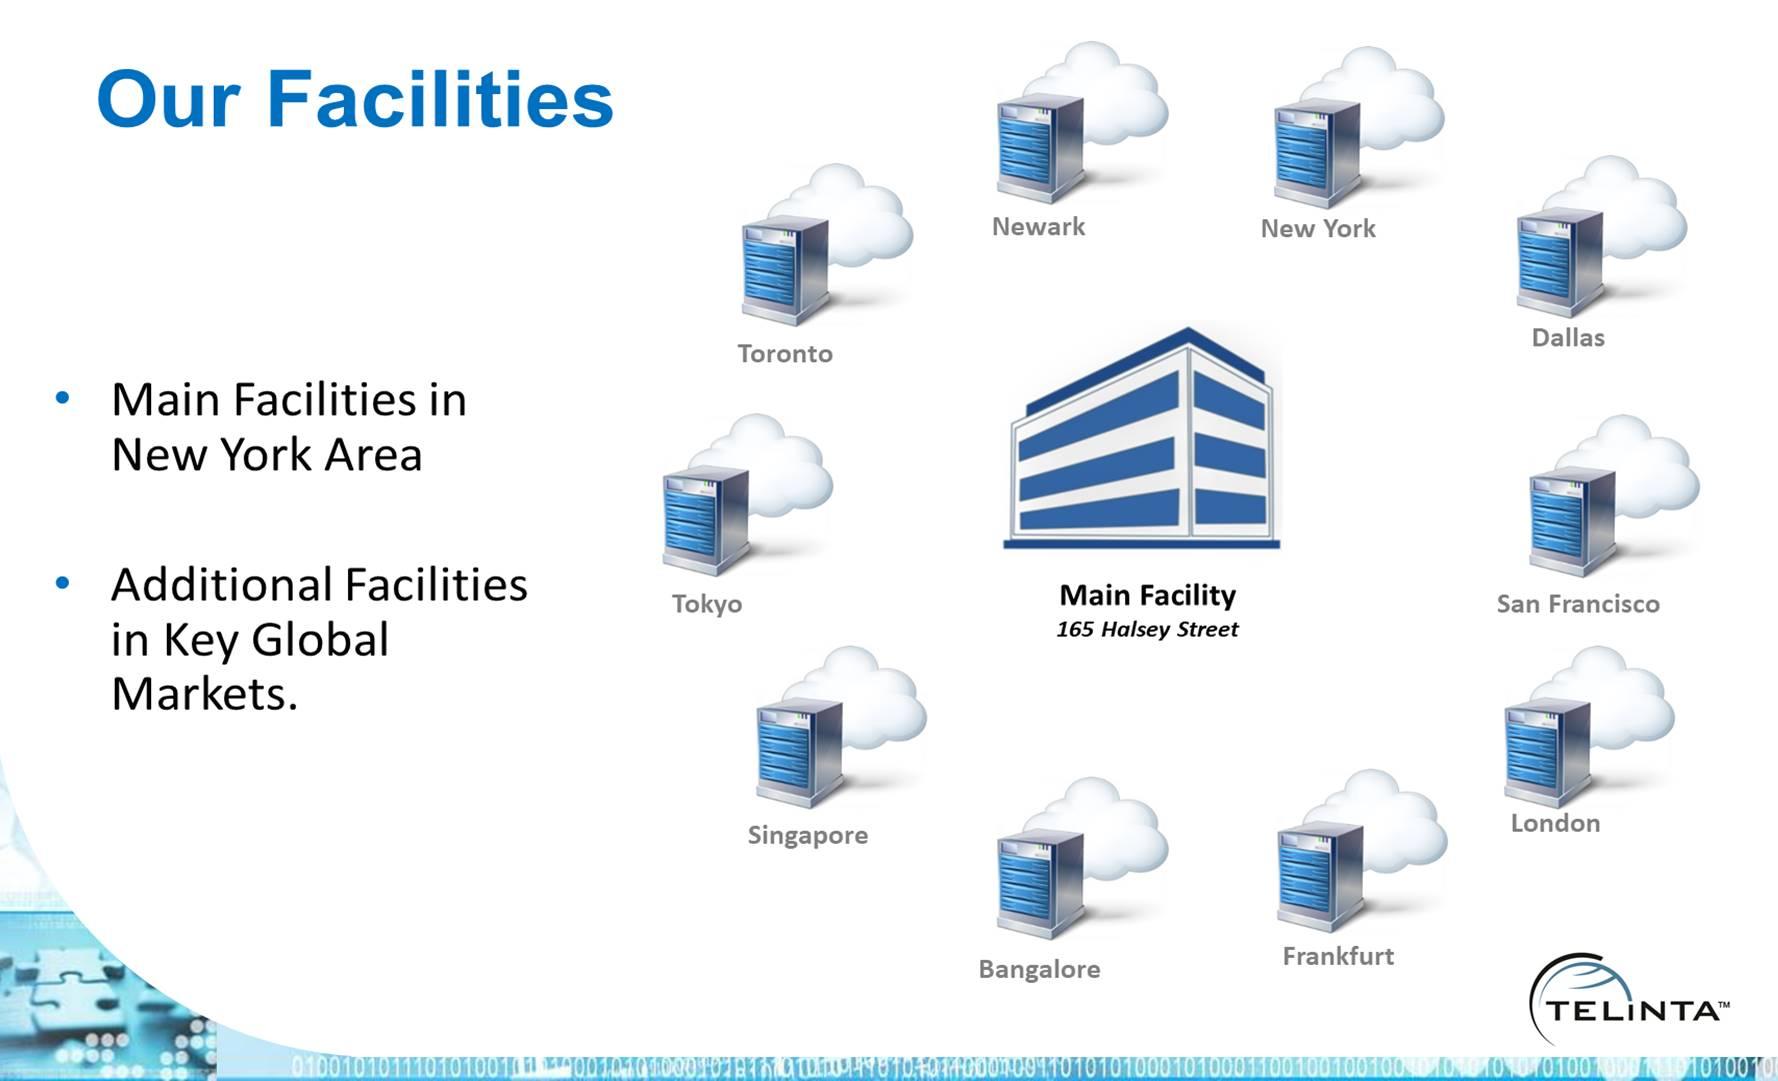 Telinta infrastructure in key global markets worldwide: New York, Bangalore, Dallas, Frankfurt, London, Newark, San Francisco, Singapore, Tokyo, and Toronto.